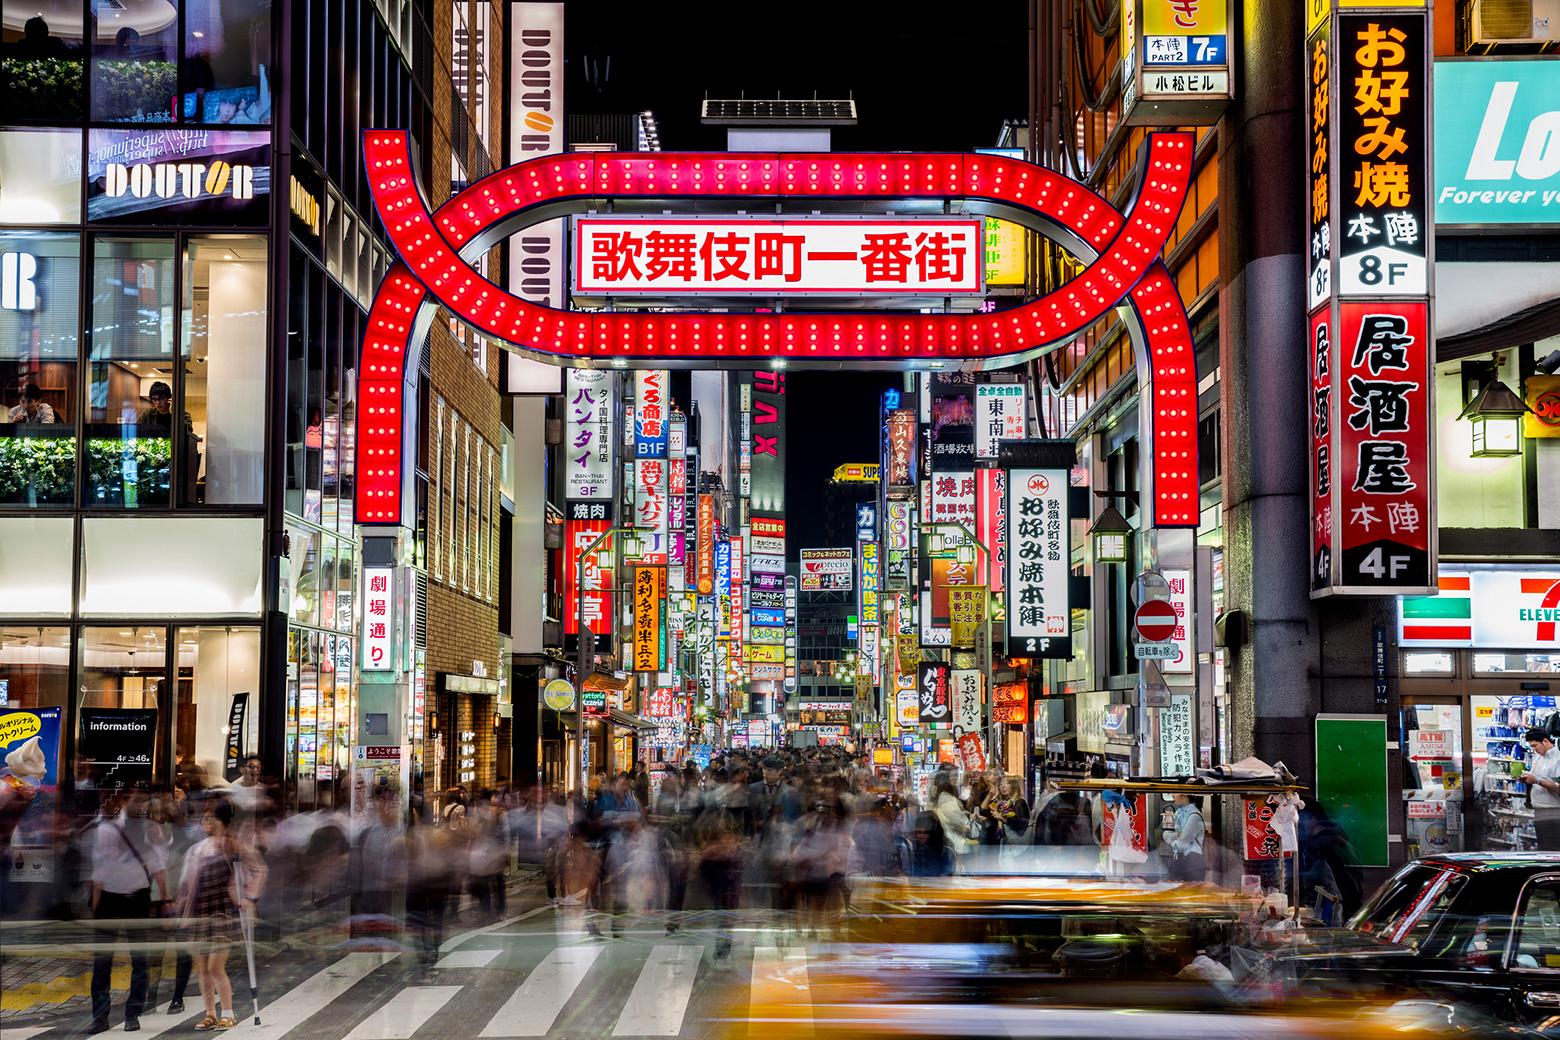 Shinjuku Kabukicho at night